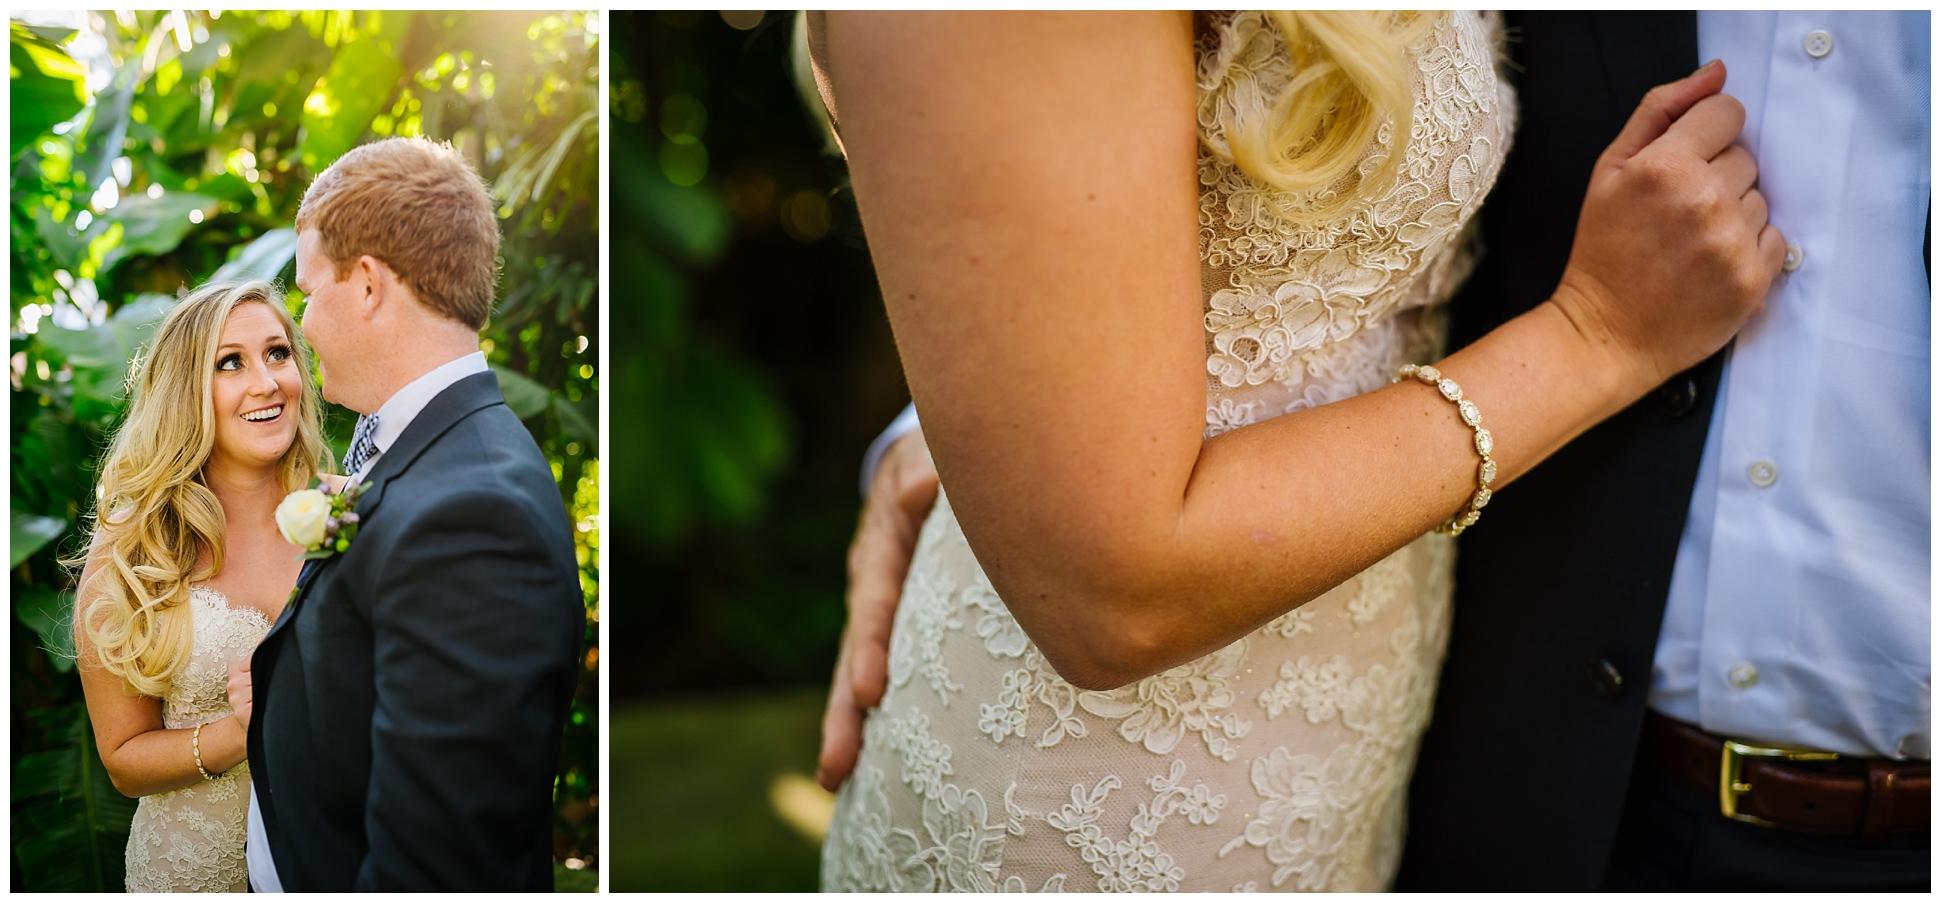 St-pete-wedding-photographer-grand-ballroom-vinoy-tea-garden-greek-luxury_0133.jpg